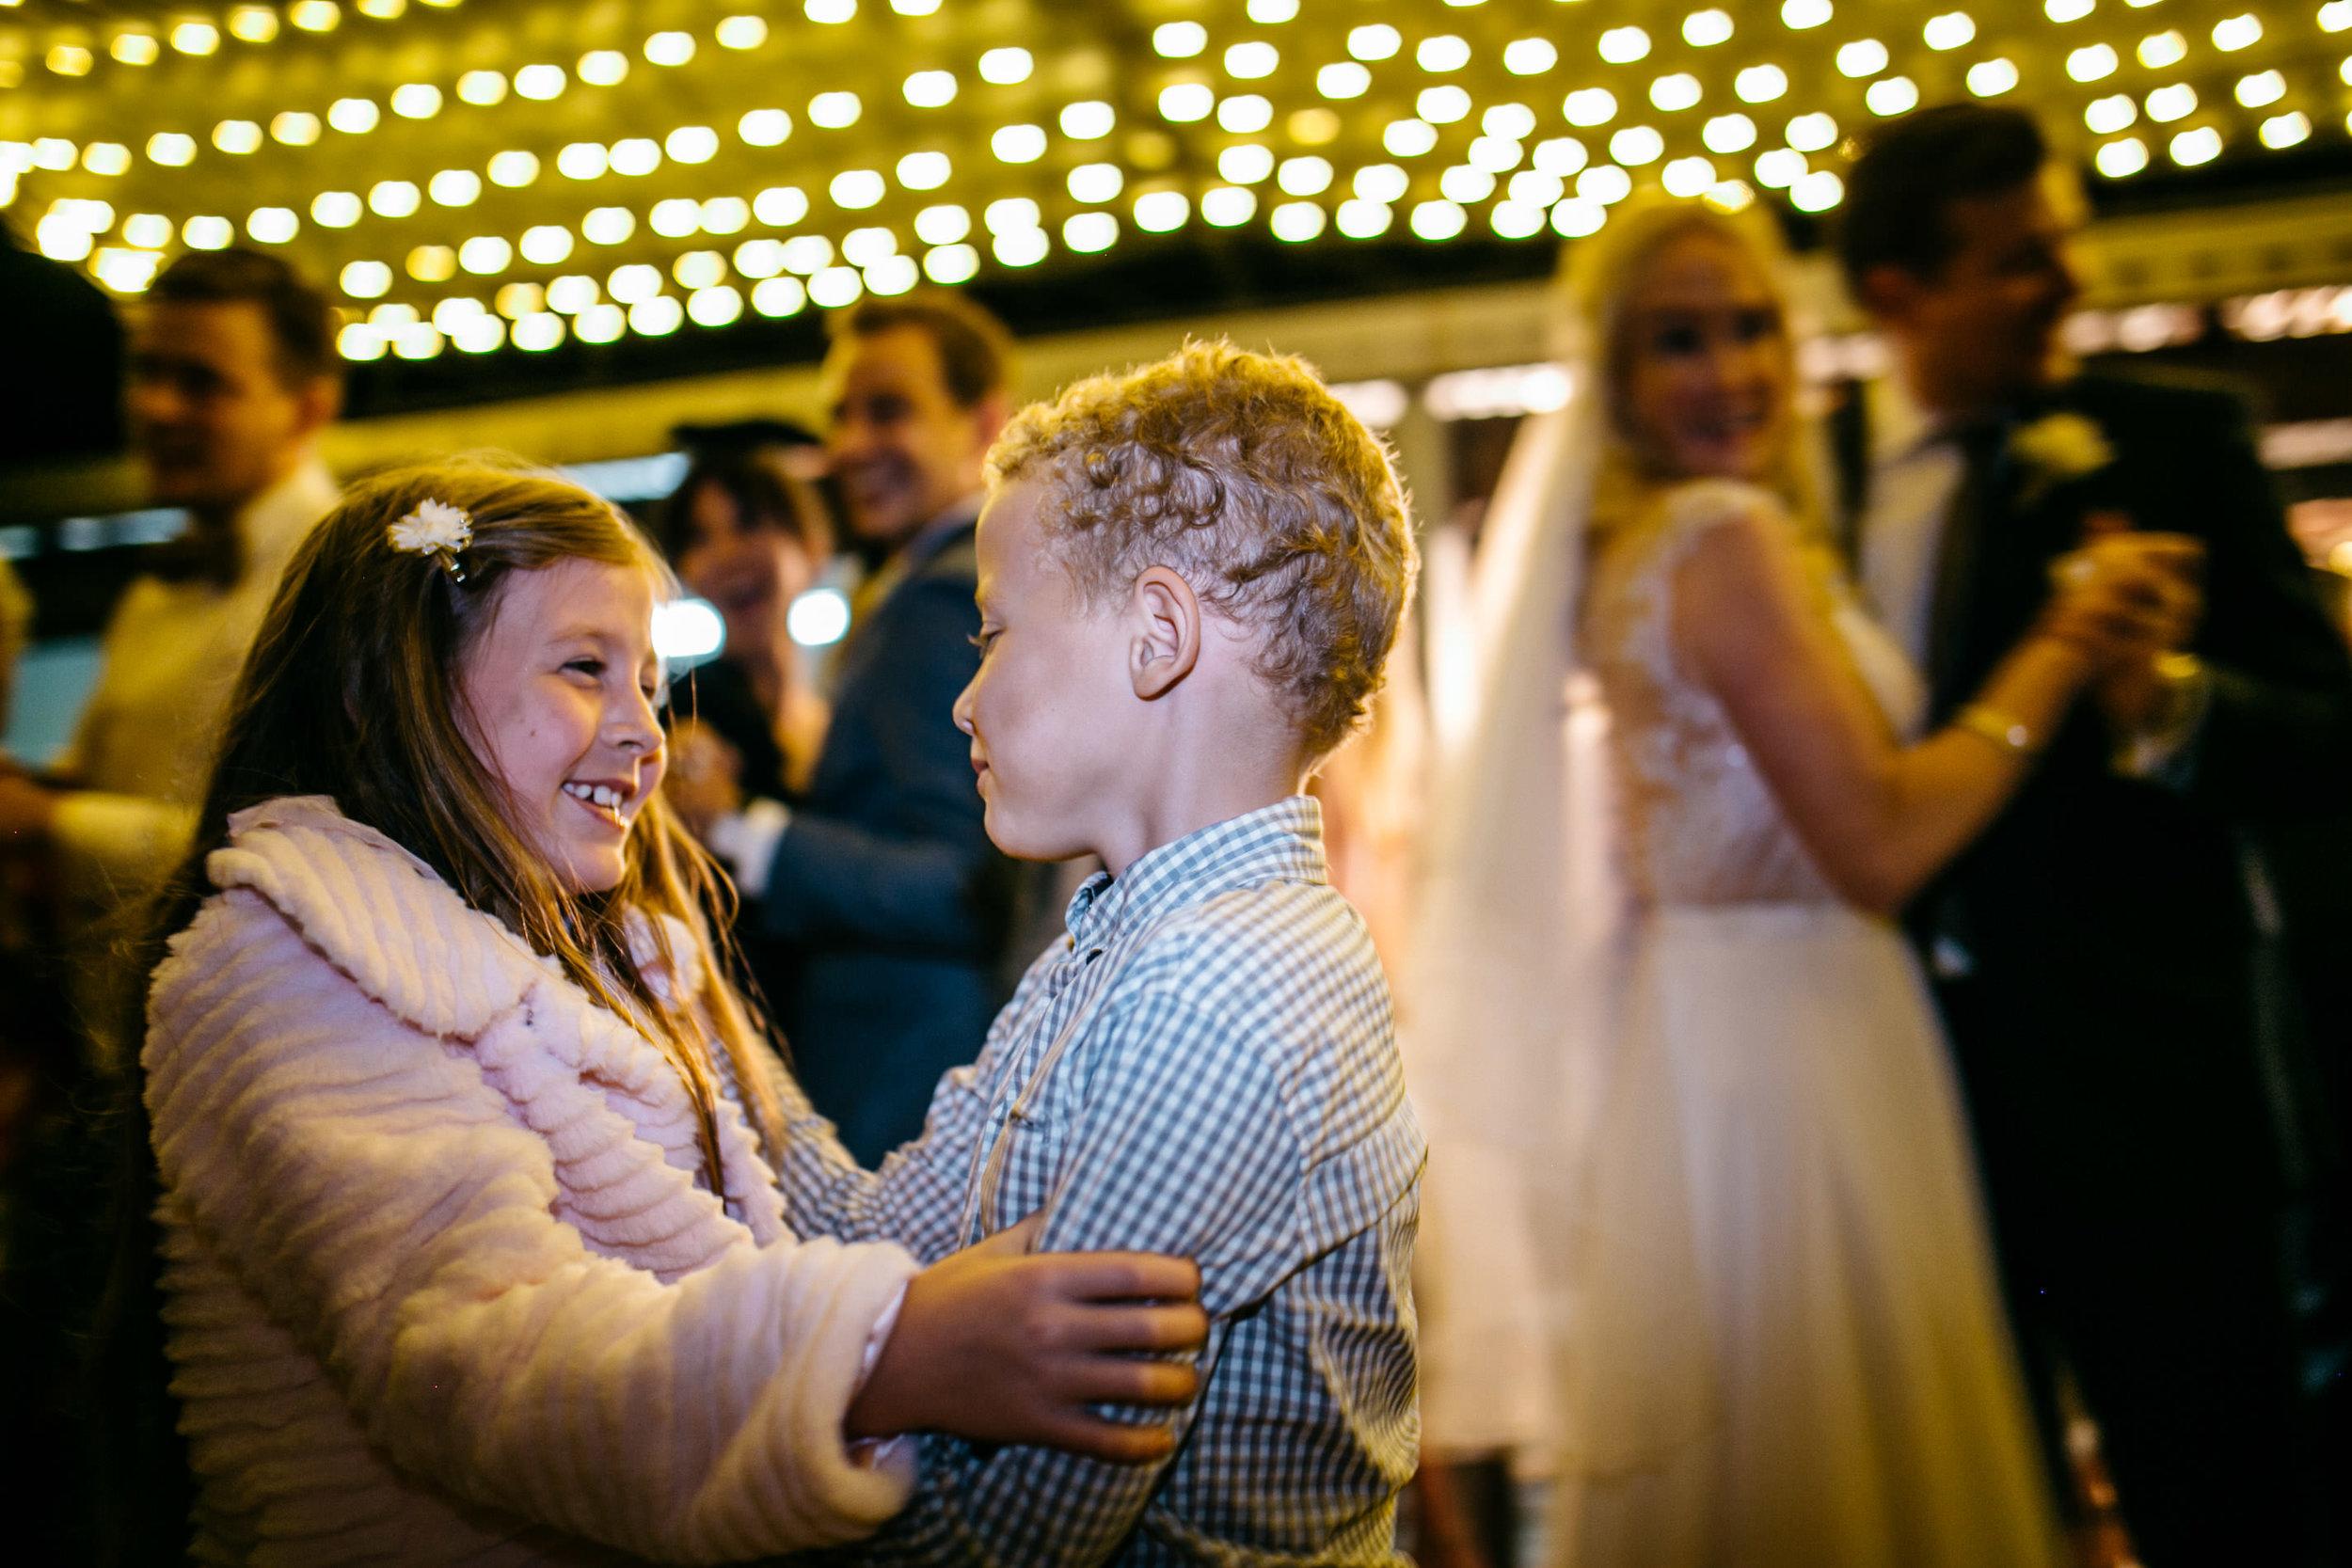 True North Photography_Boomerang Farm_Stacey and Isaac_Gold Coast Wedding_Barm Wedding_Hinterland Wedding-213.jpg